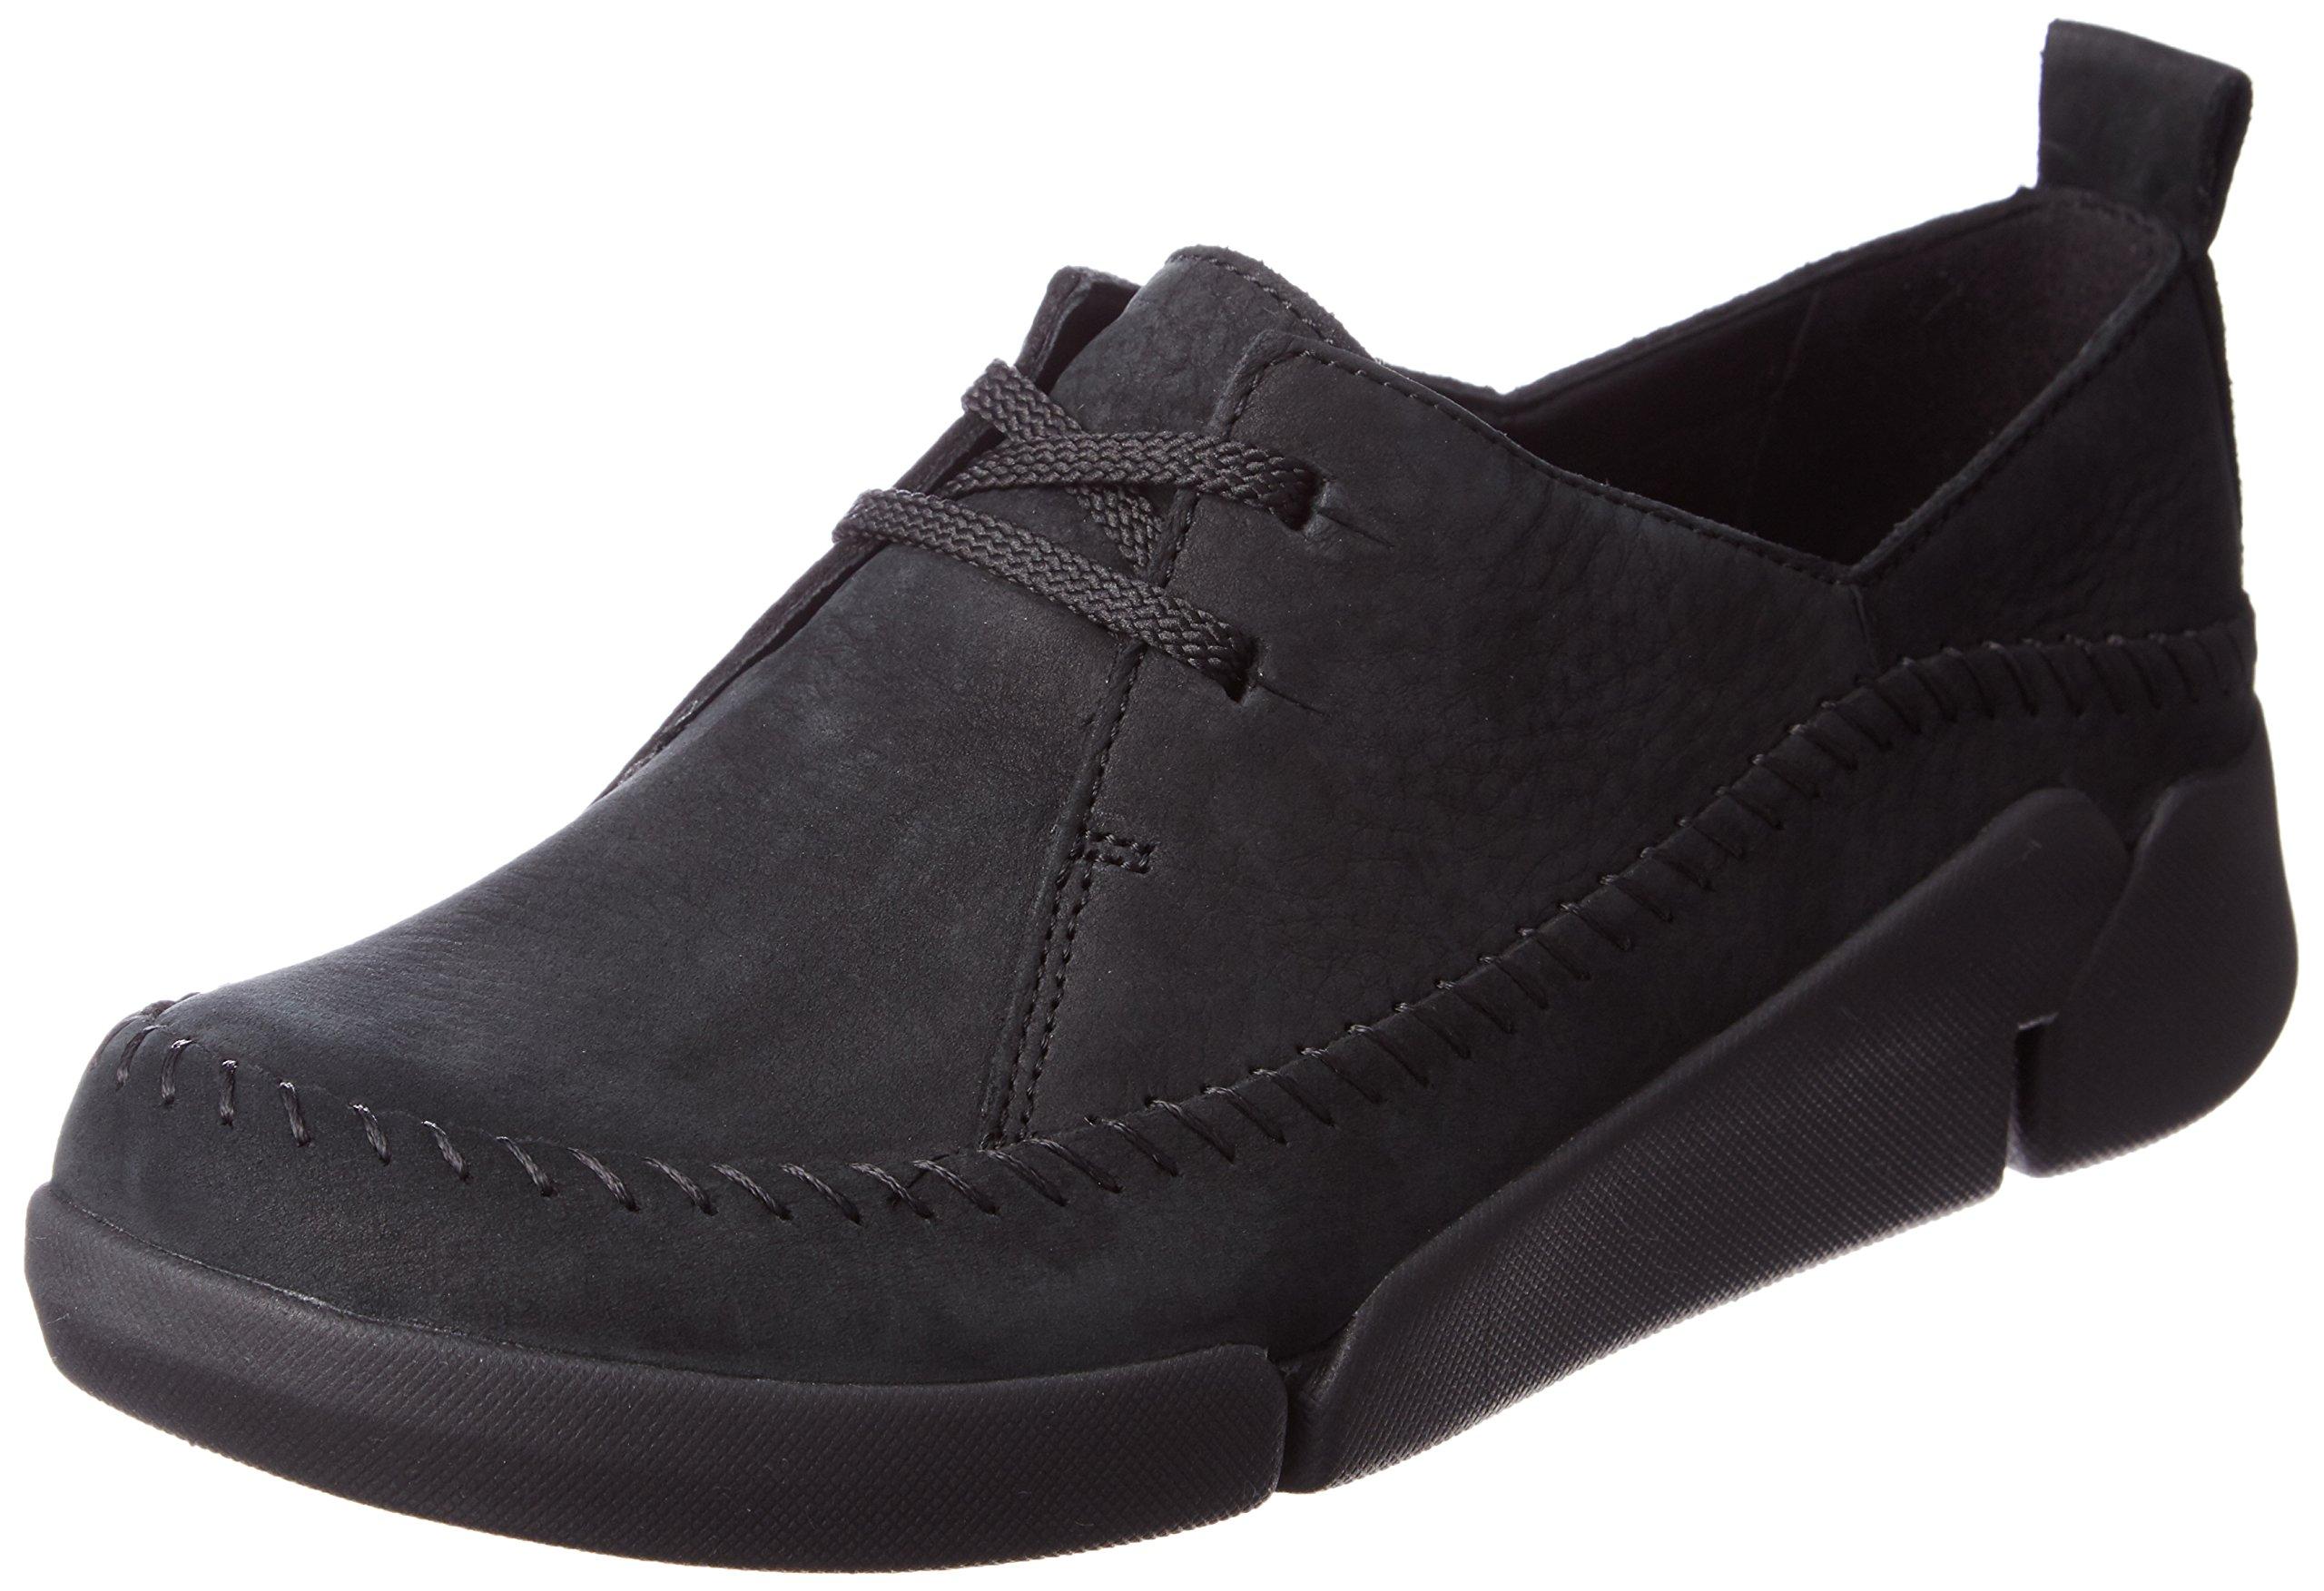 Basses Lea41 5 Tri AngelSneakers Clarks Combi FemmeNoirblack ZiulOkwTPX